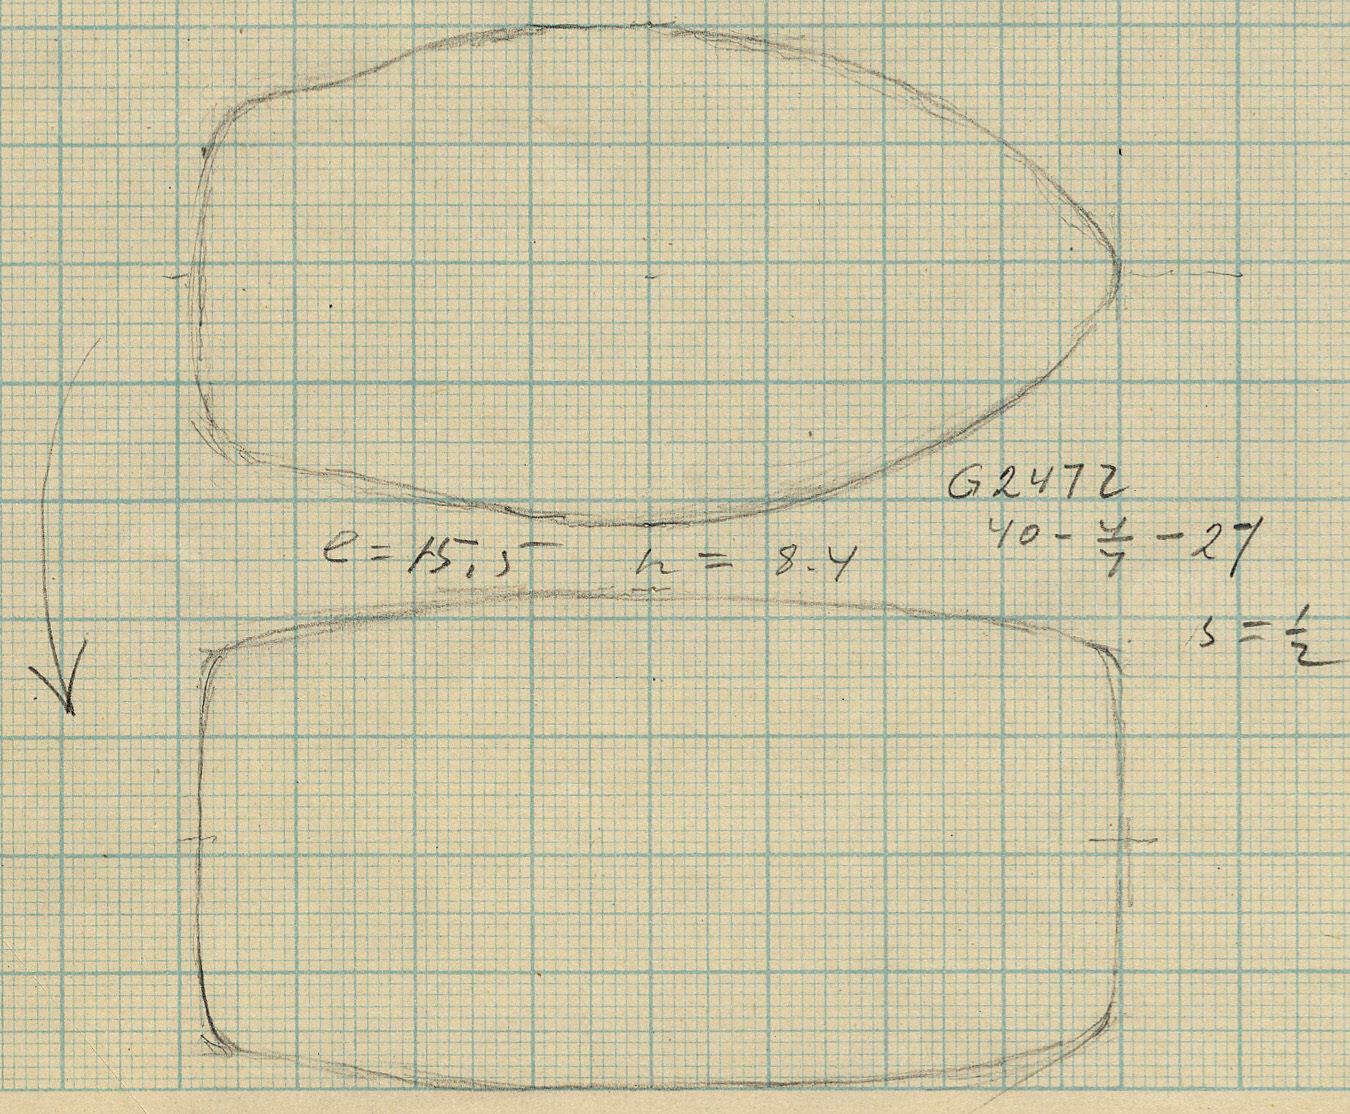 Drawings: G 2472: hammer or axe head